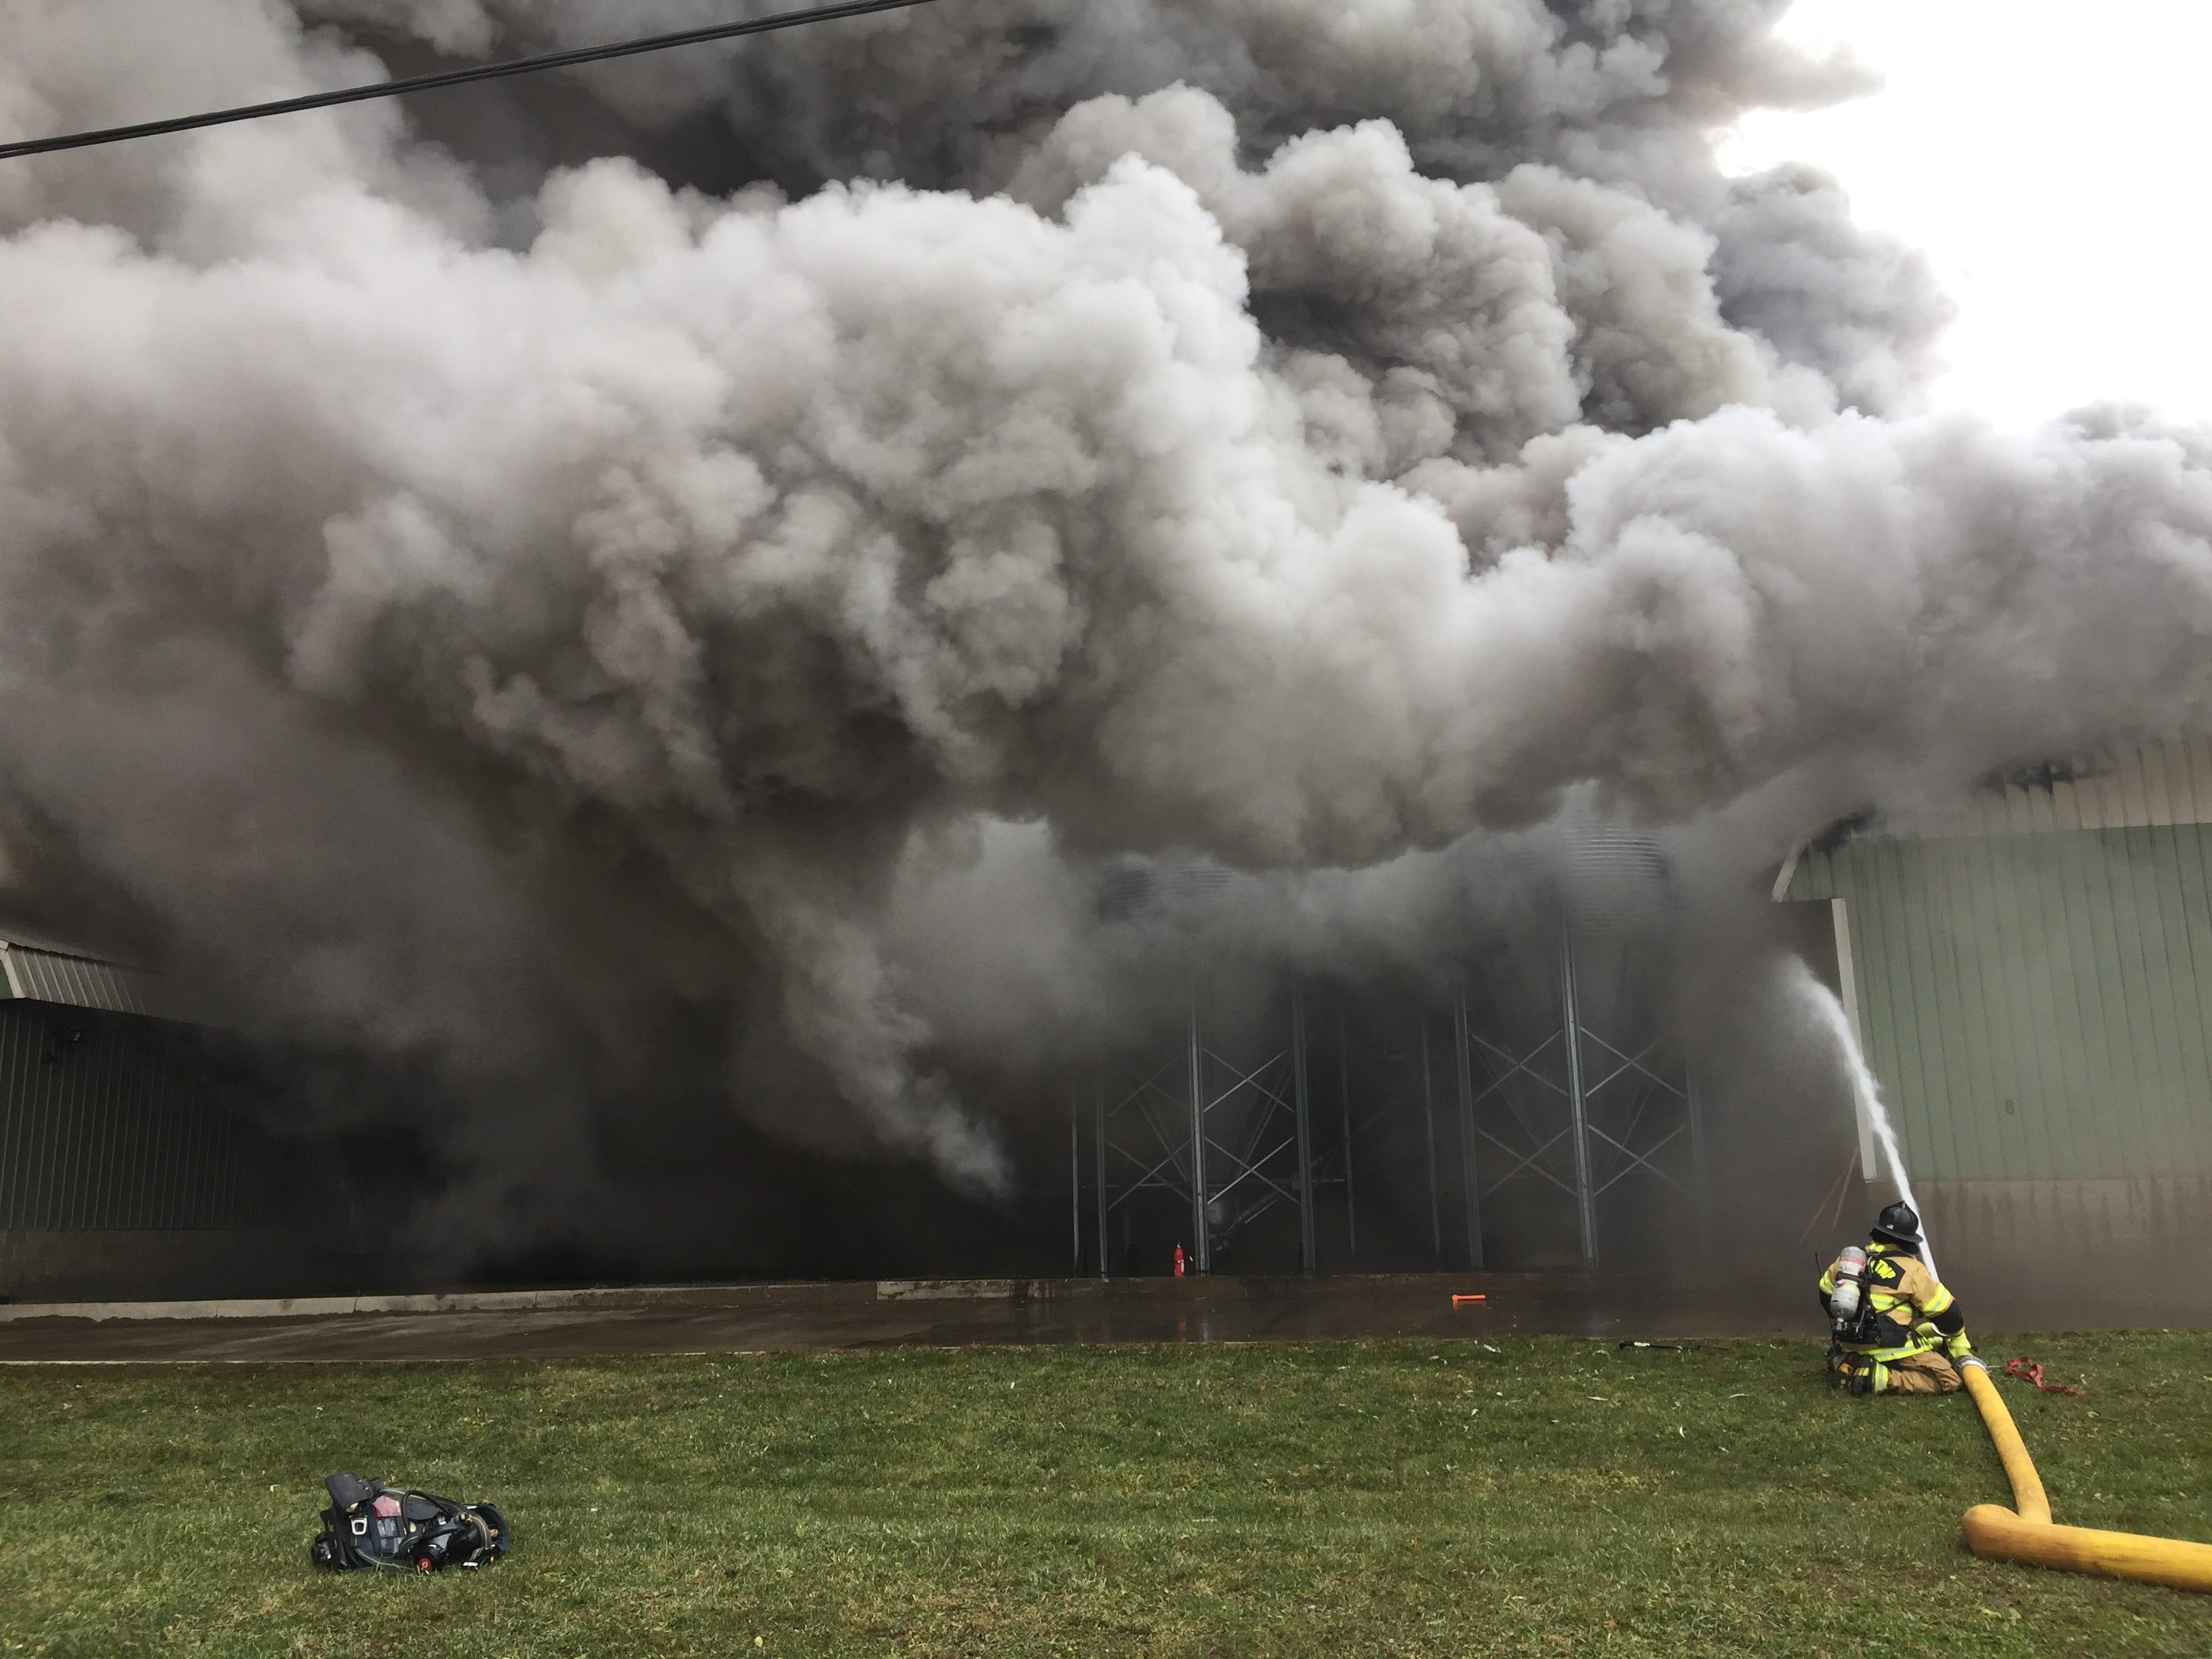 Firefighters battle a blaze at Trillium Farms in Croton.